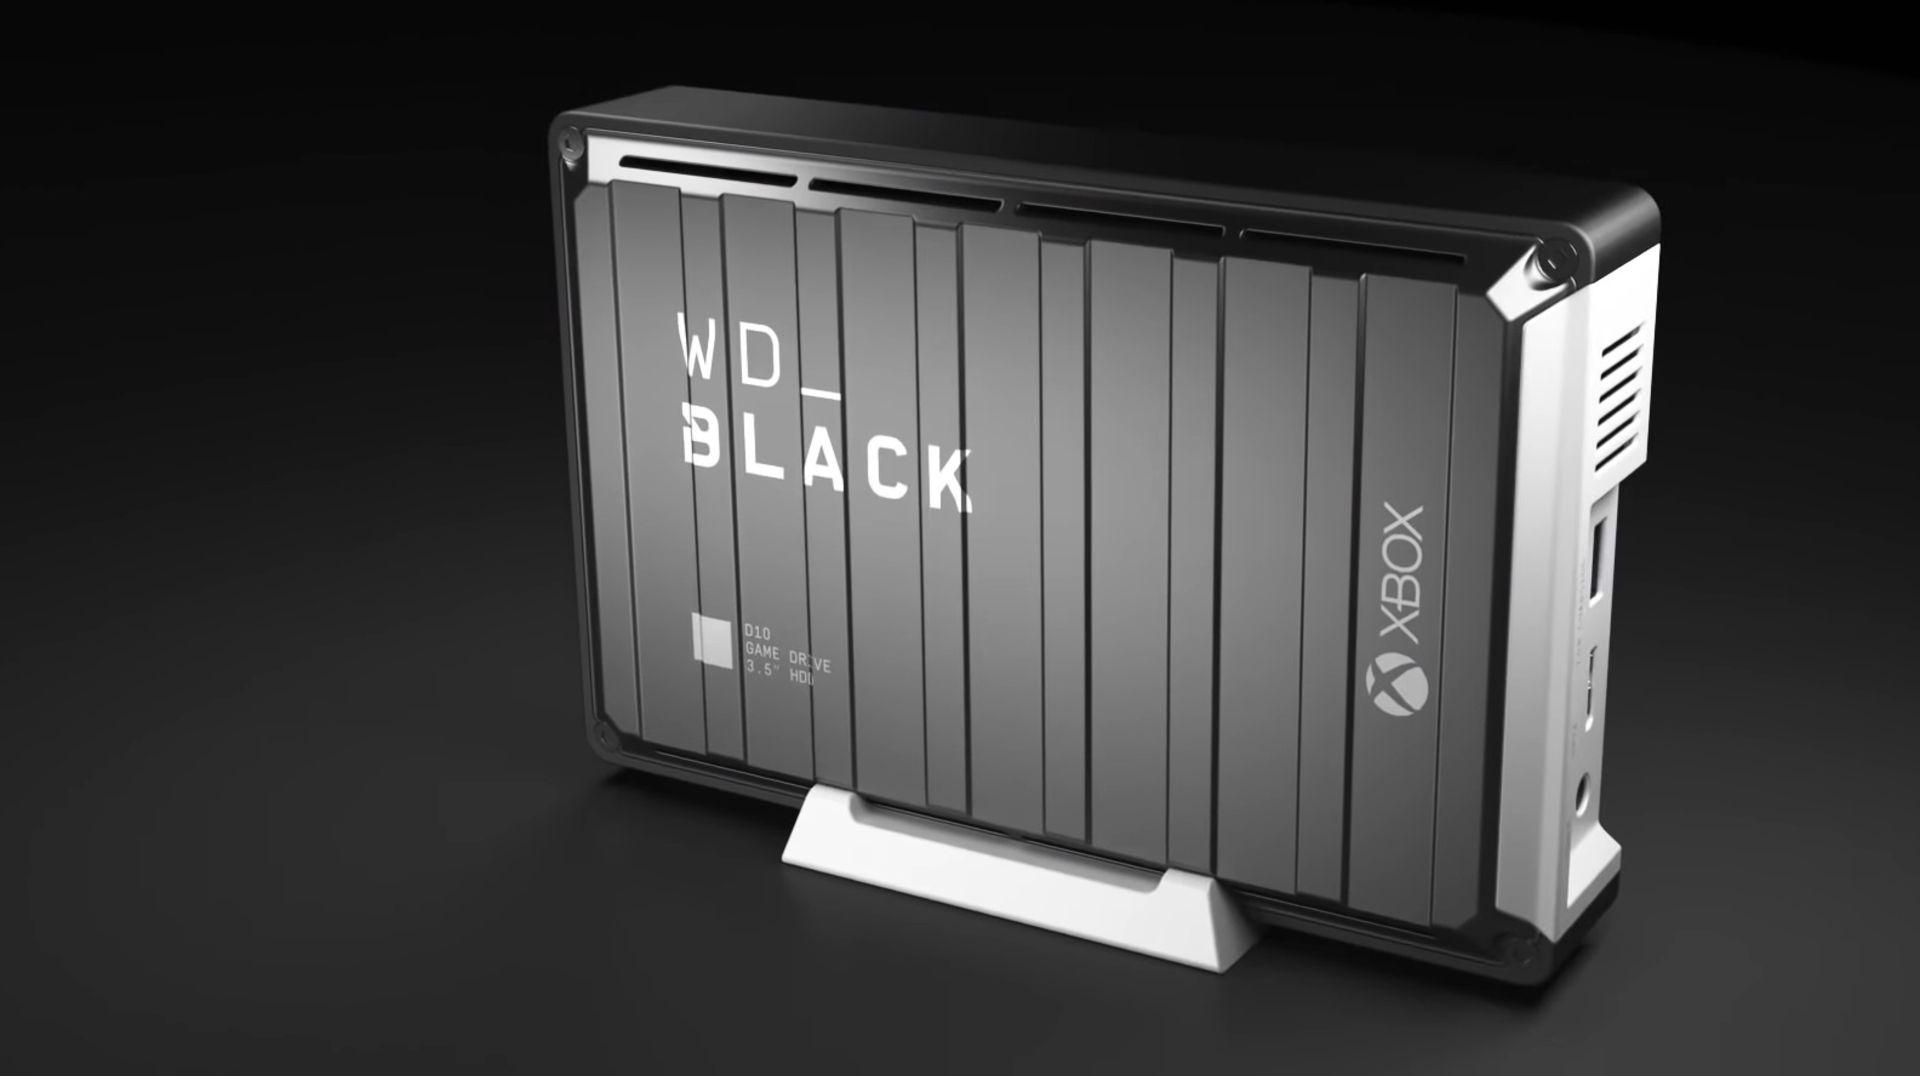 wd_black d10